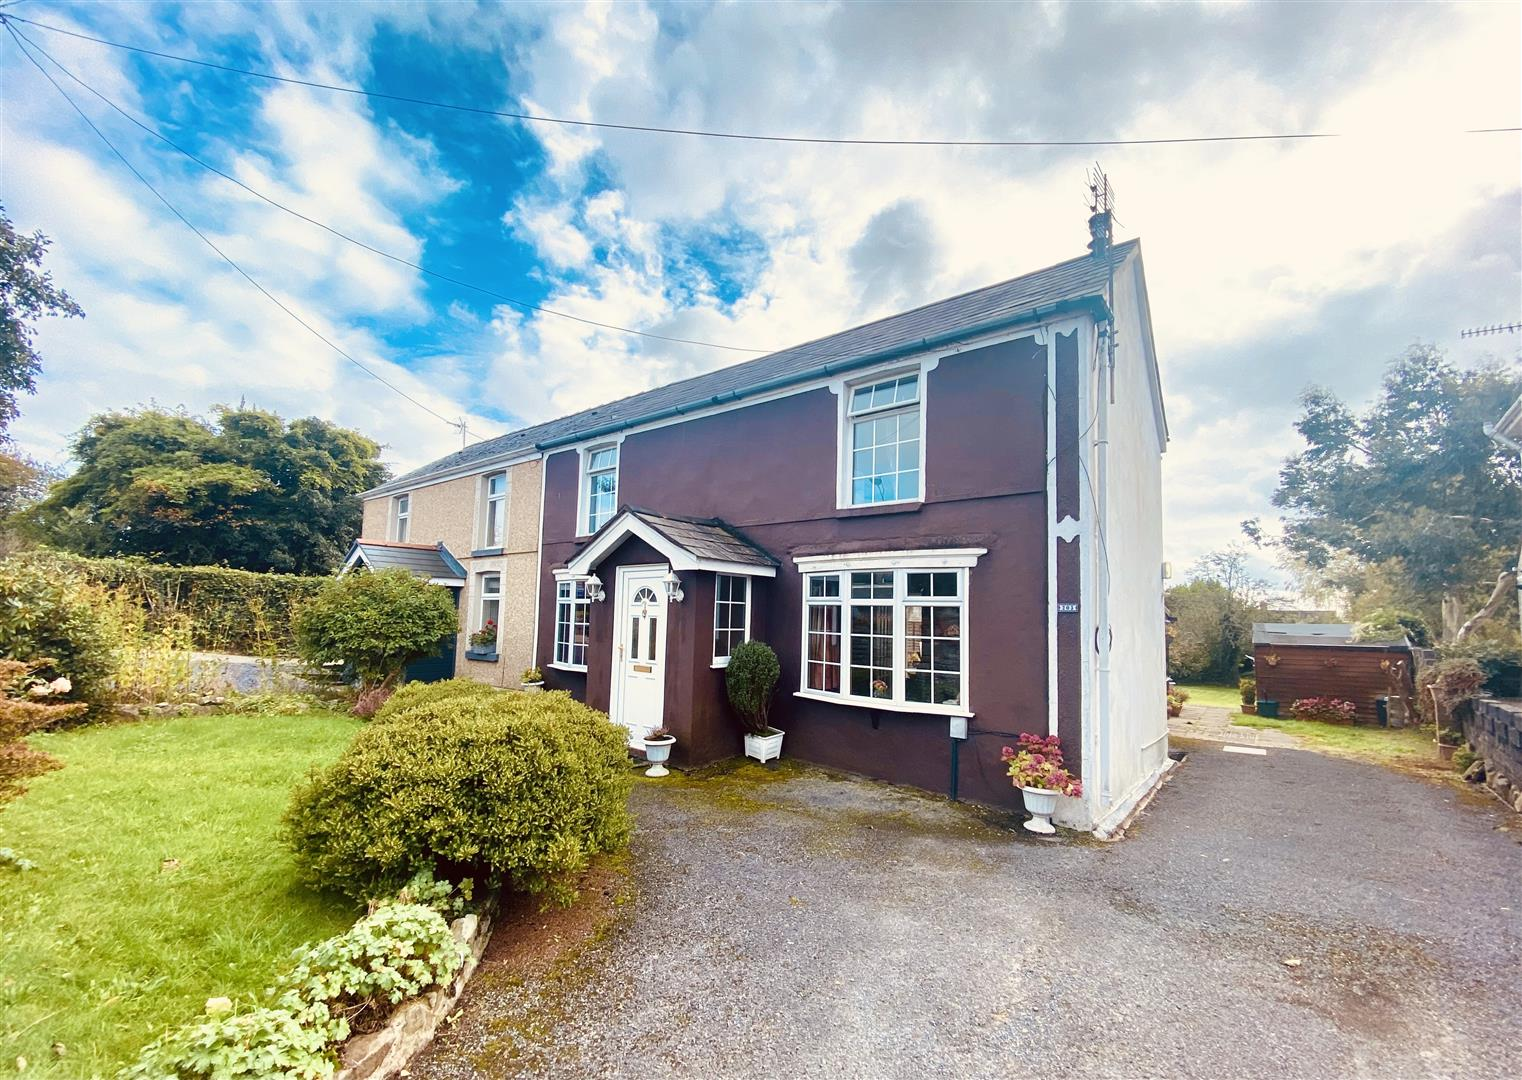 Dunvant road, Dunvant, Killay, Swansea, SA2 7SR